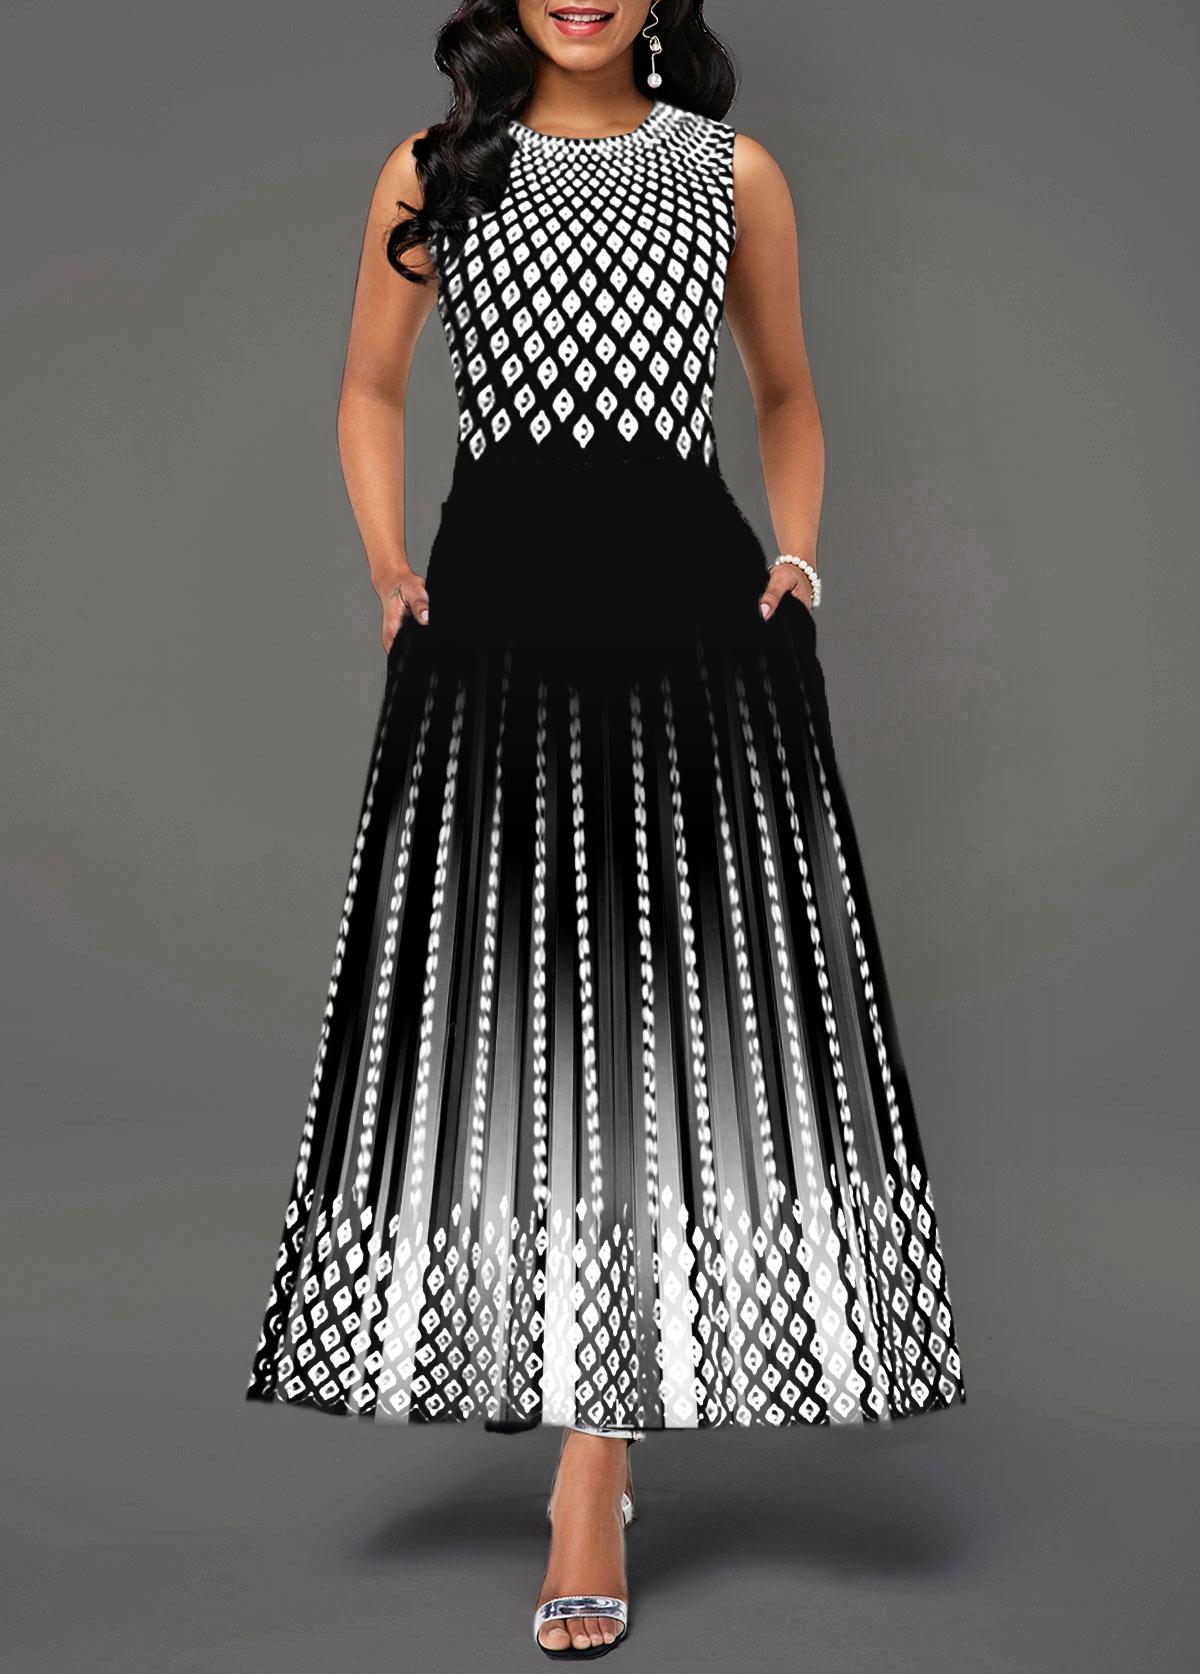 Round Neck Sleeveless High Waist Dress